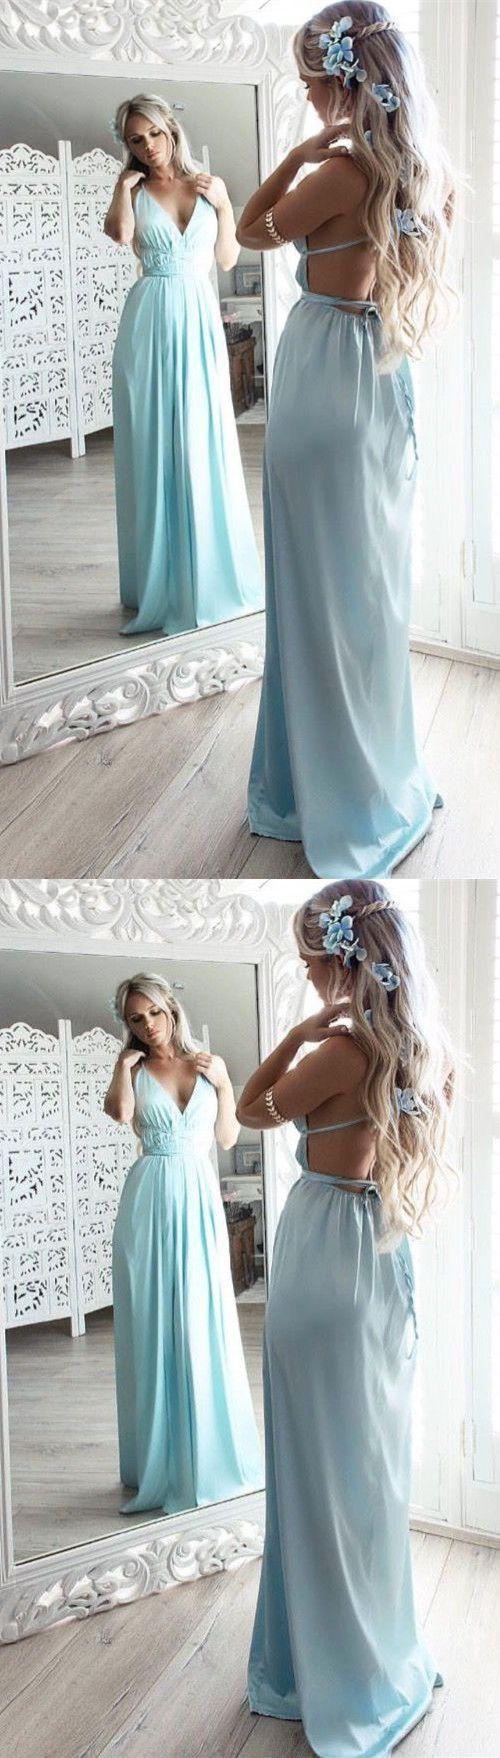 Green backless prom dress  ALine Prom DressesSpaghetti Straps Prom DressesBackless Prom